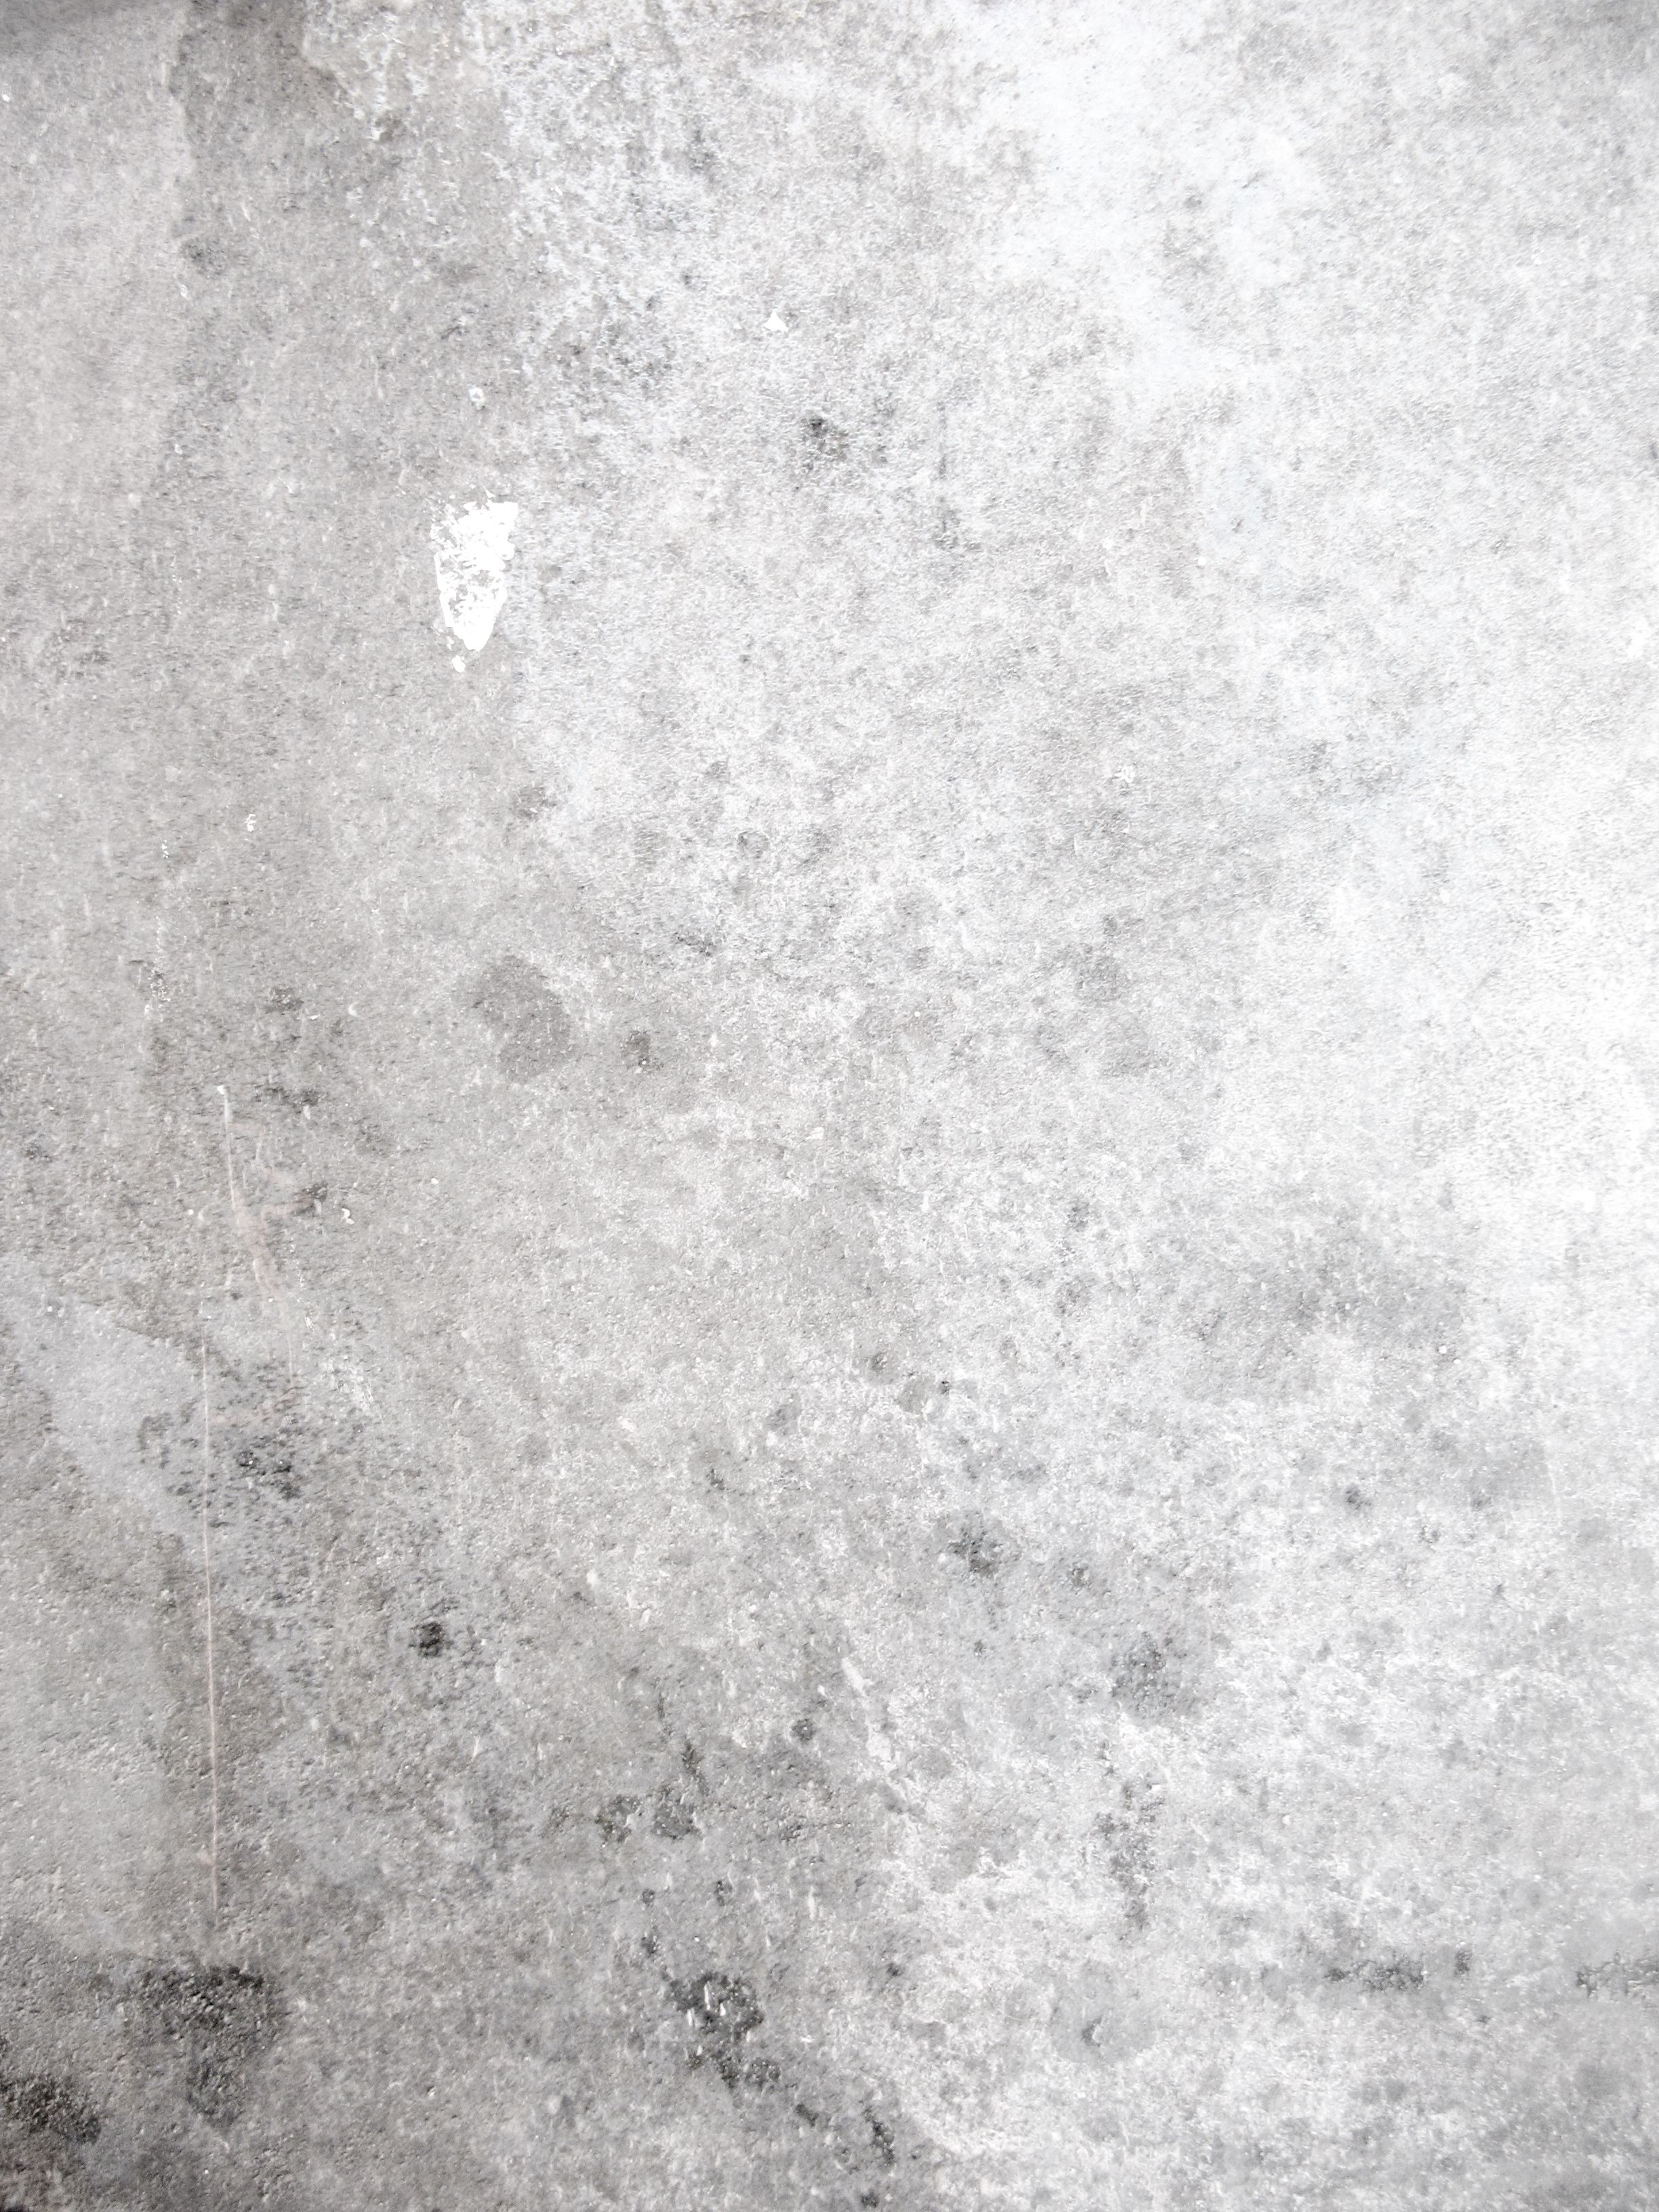 Rev tement de mur sol lunaire rev tement texture pinterest lunaire revetement et texture - Revetement de mur ...